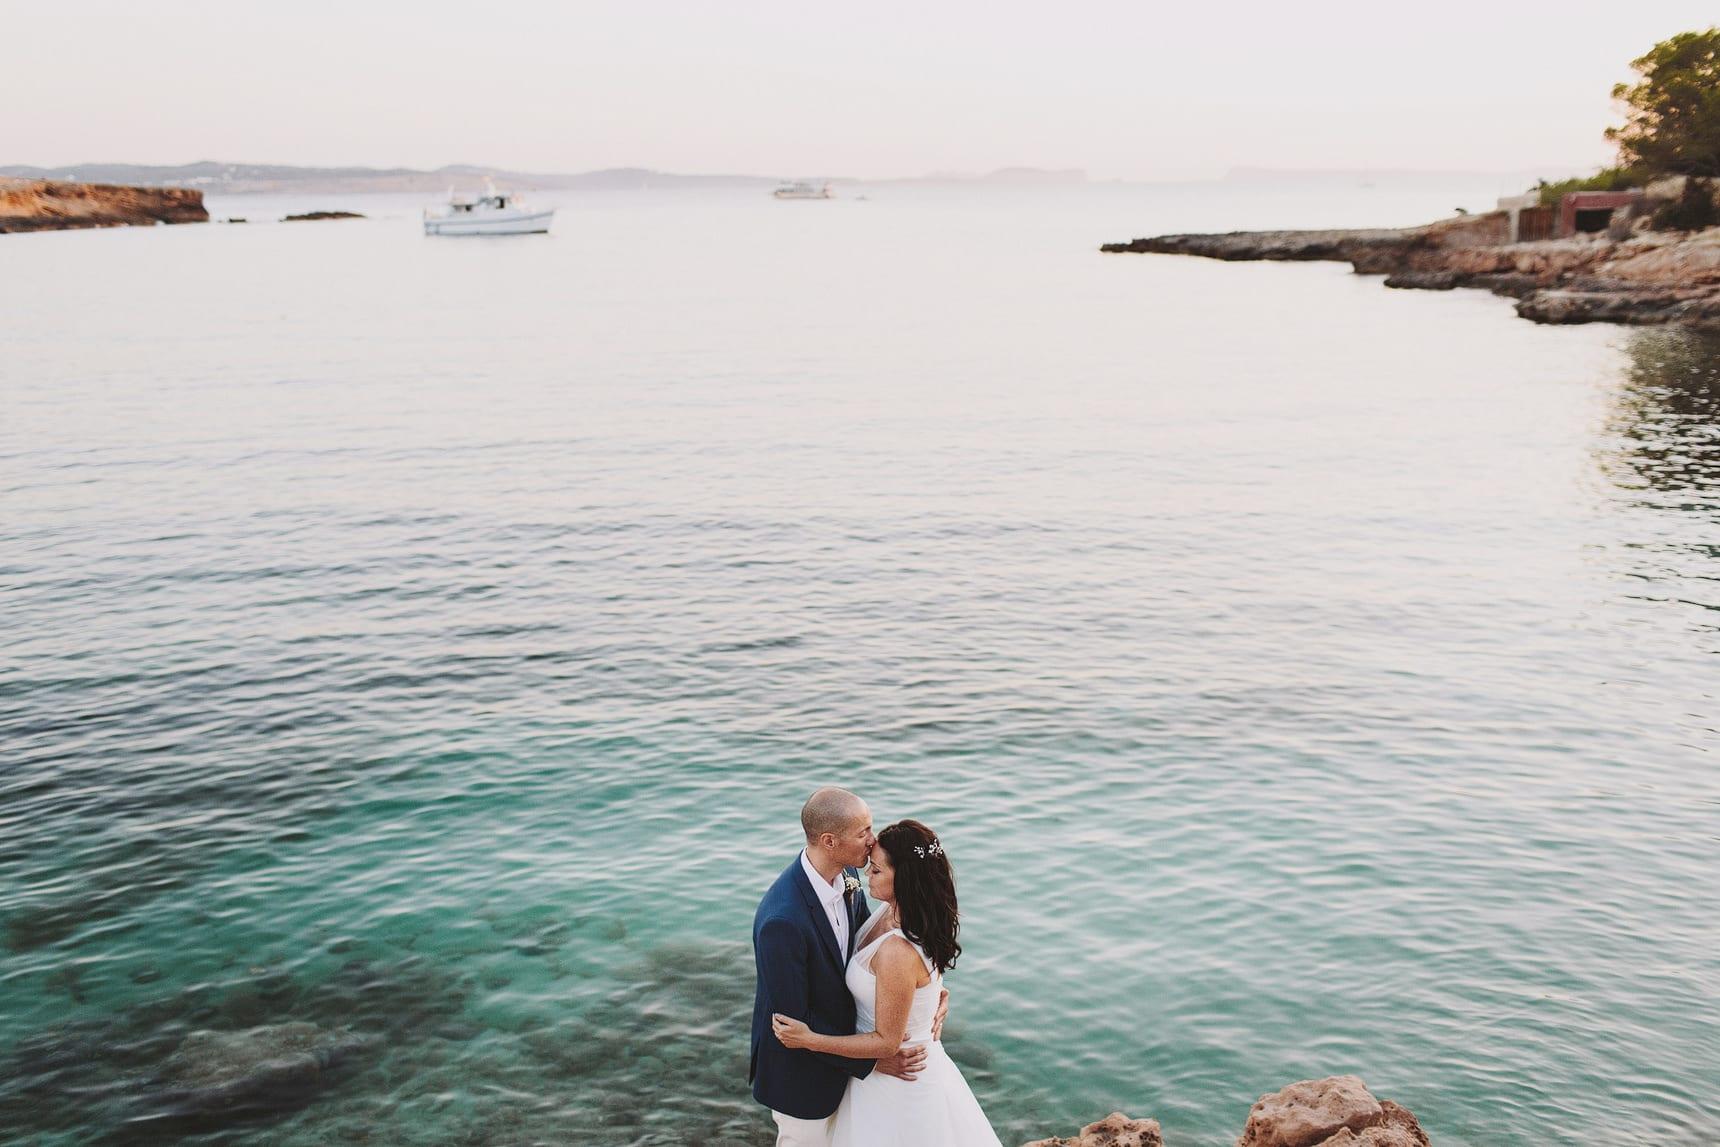 oceanfront wedding photos